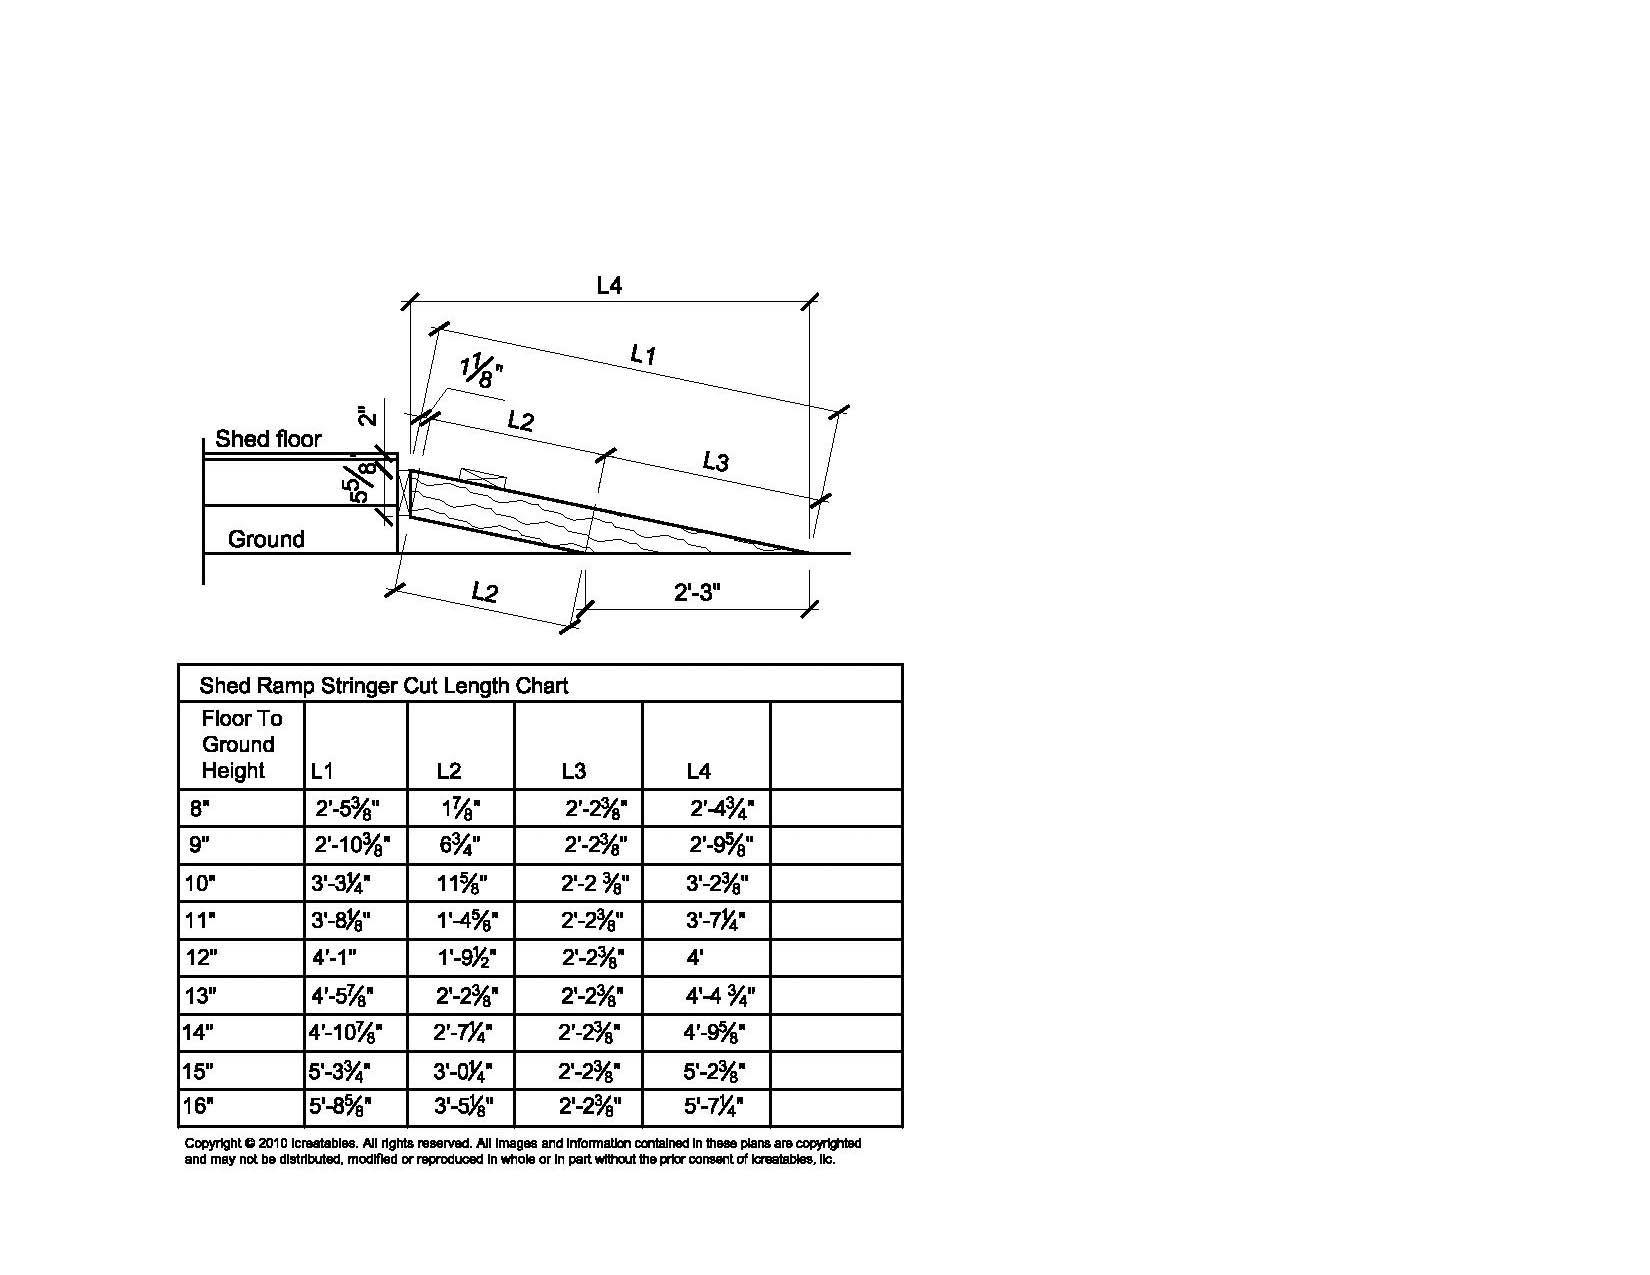 Shed Ramp Stringer Cut Chart